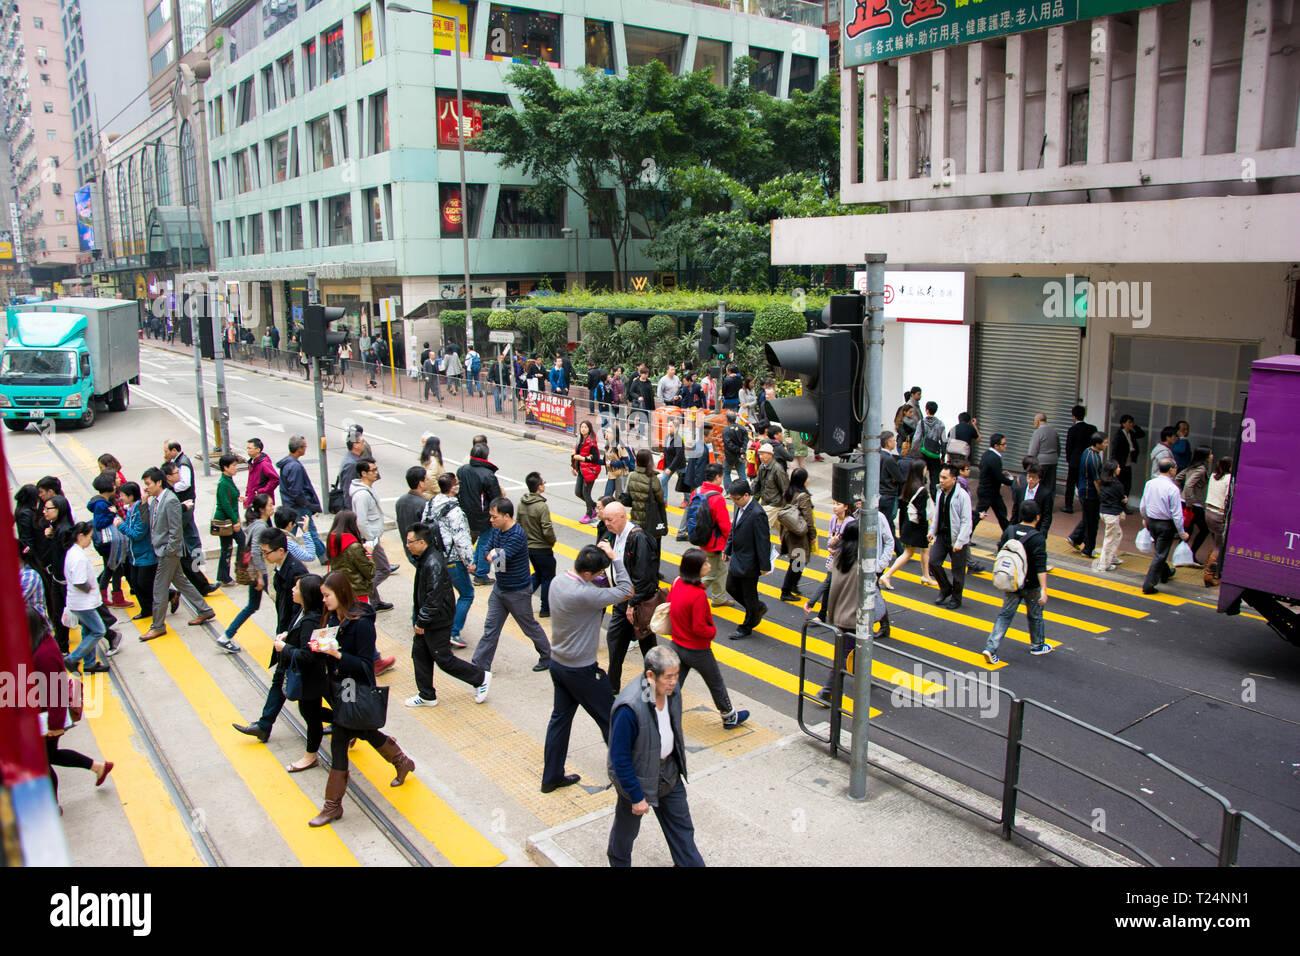 Hong Kong, December 2013: Busy pedestrian crossing at Hong Kong, viewed from the tram. Stock Photo